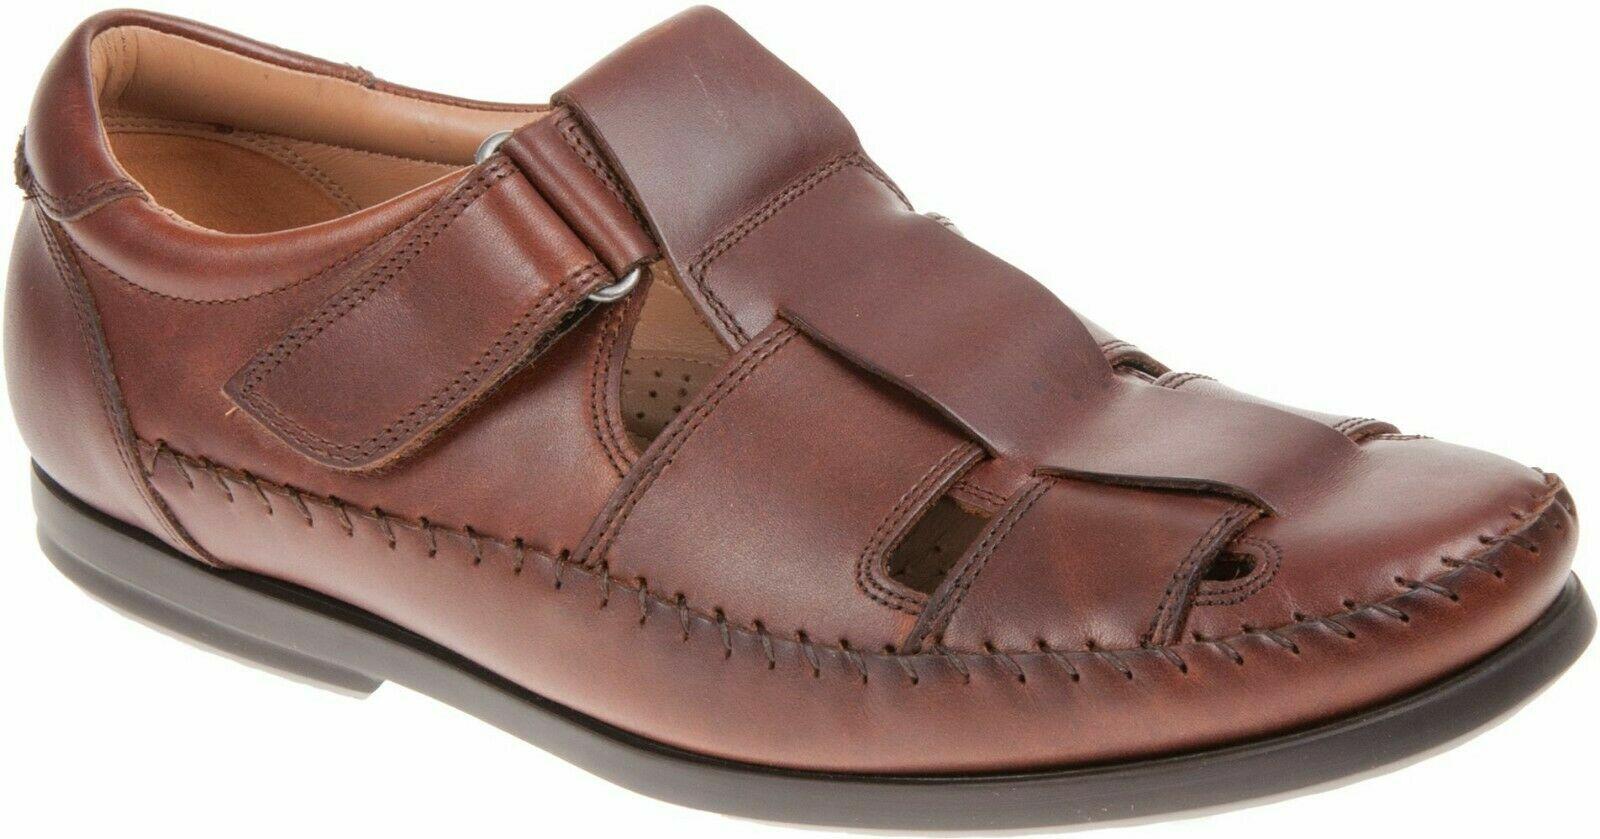 Clarks Unstructured Gala Strap Dark Tan Leather Men's Sandals Size UK 9 1/2G.